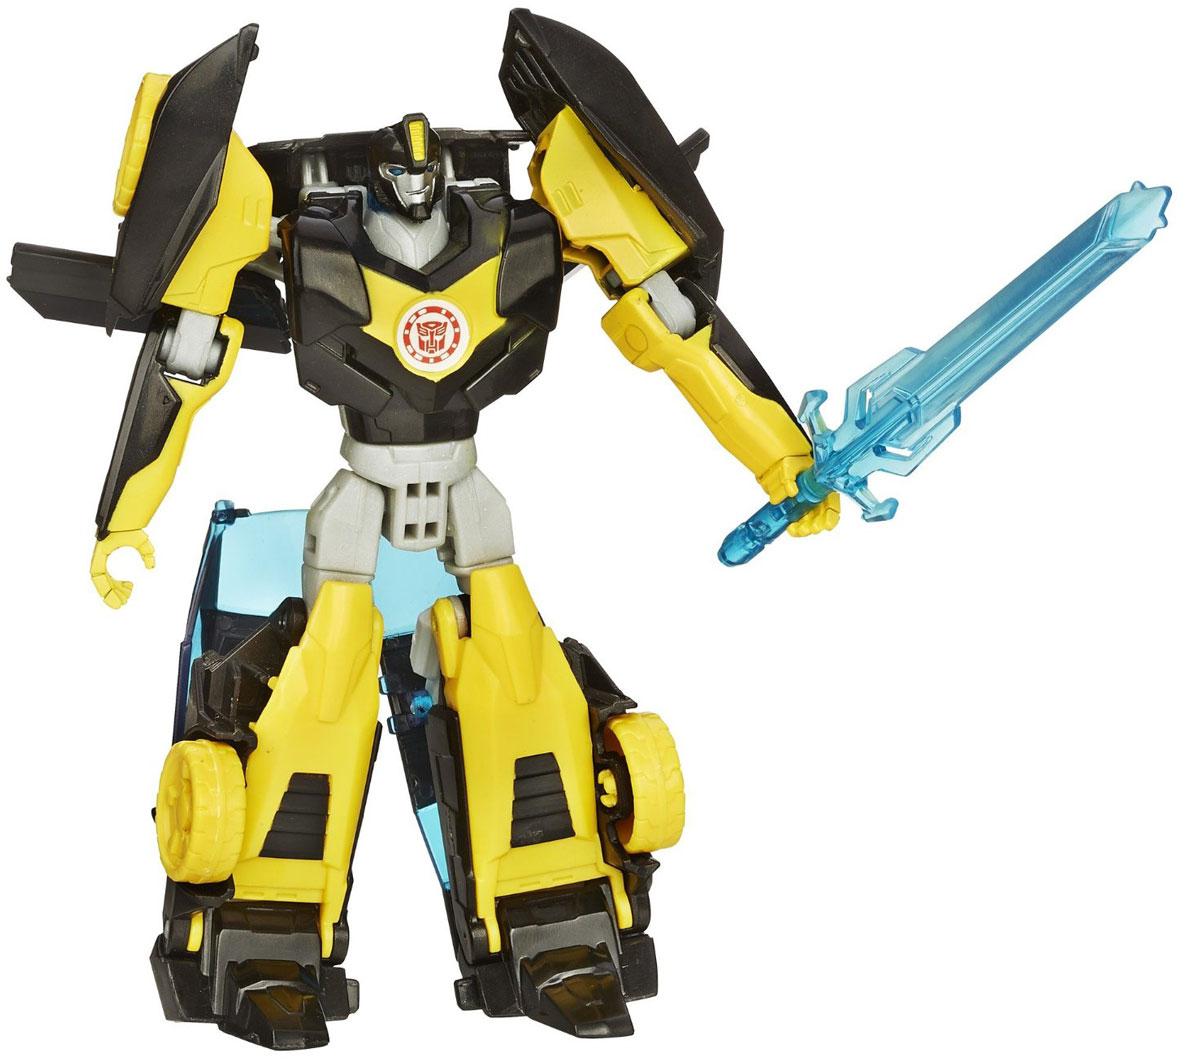 Transformers work